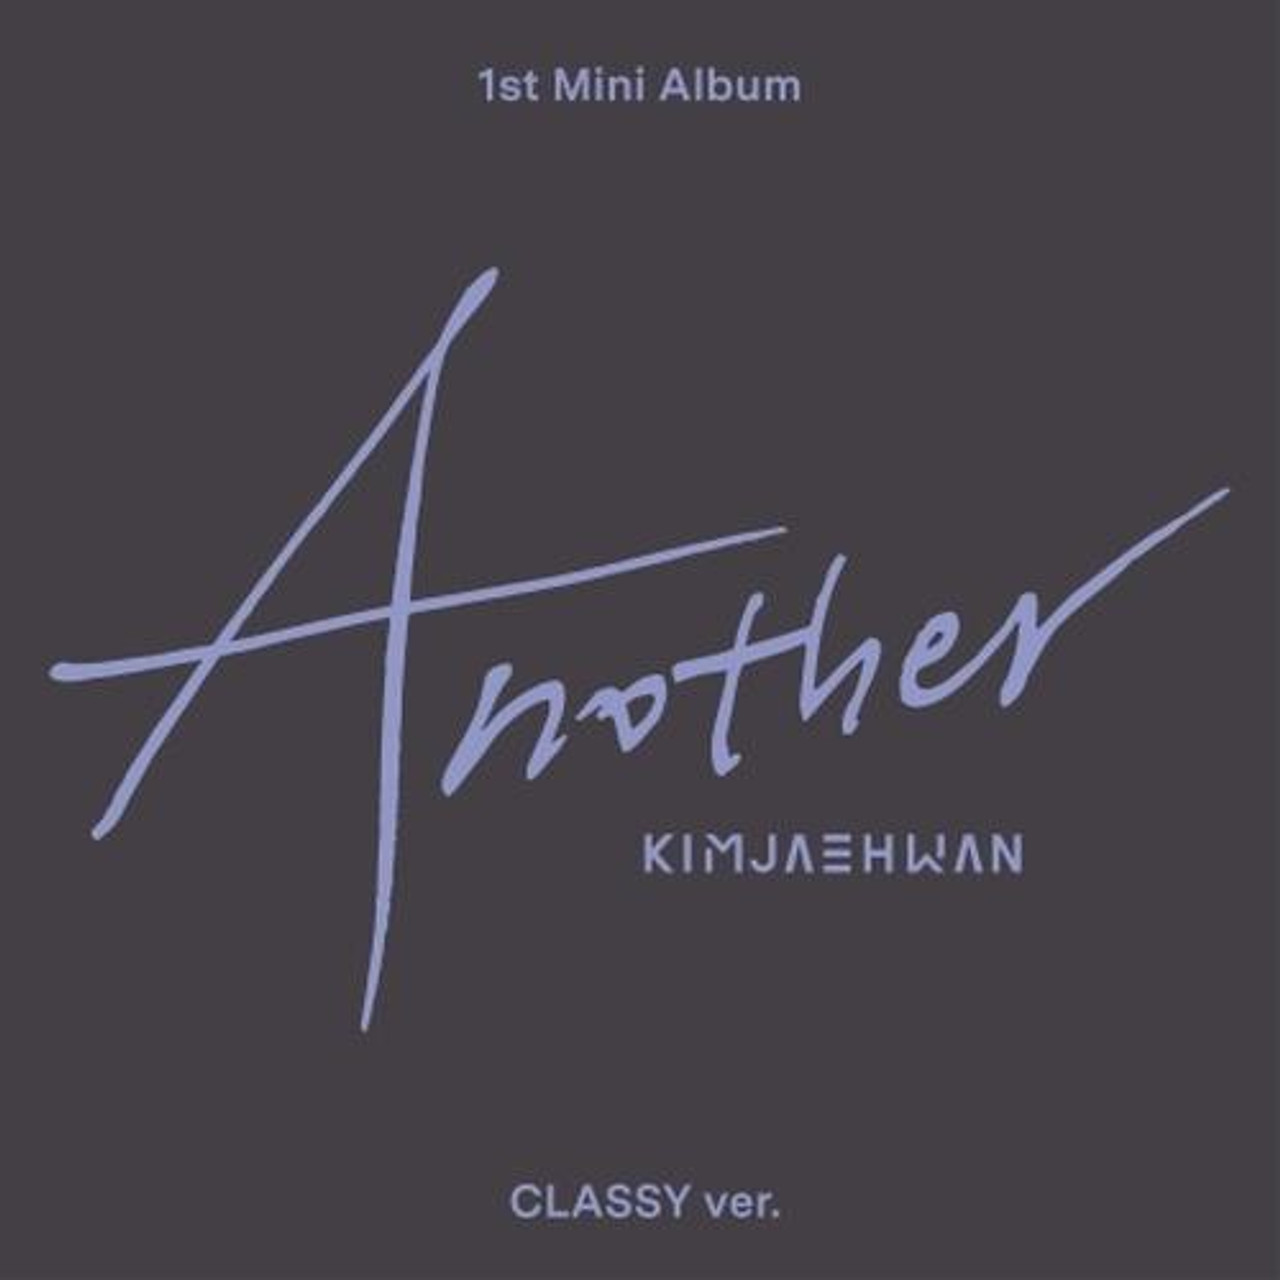 Kim Jae Hwan - 1st Mini [Another] Classy Ver. + Poster